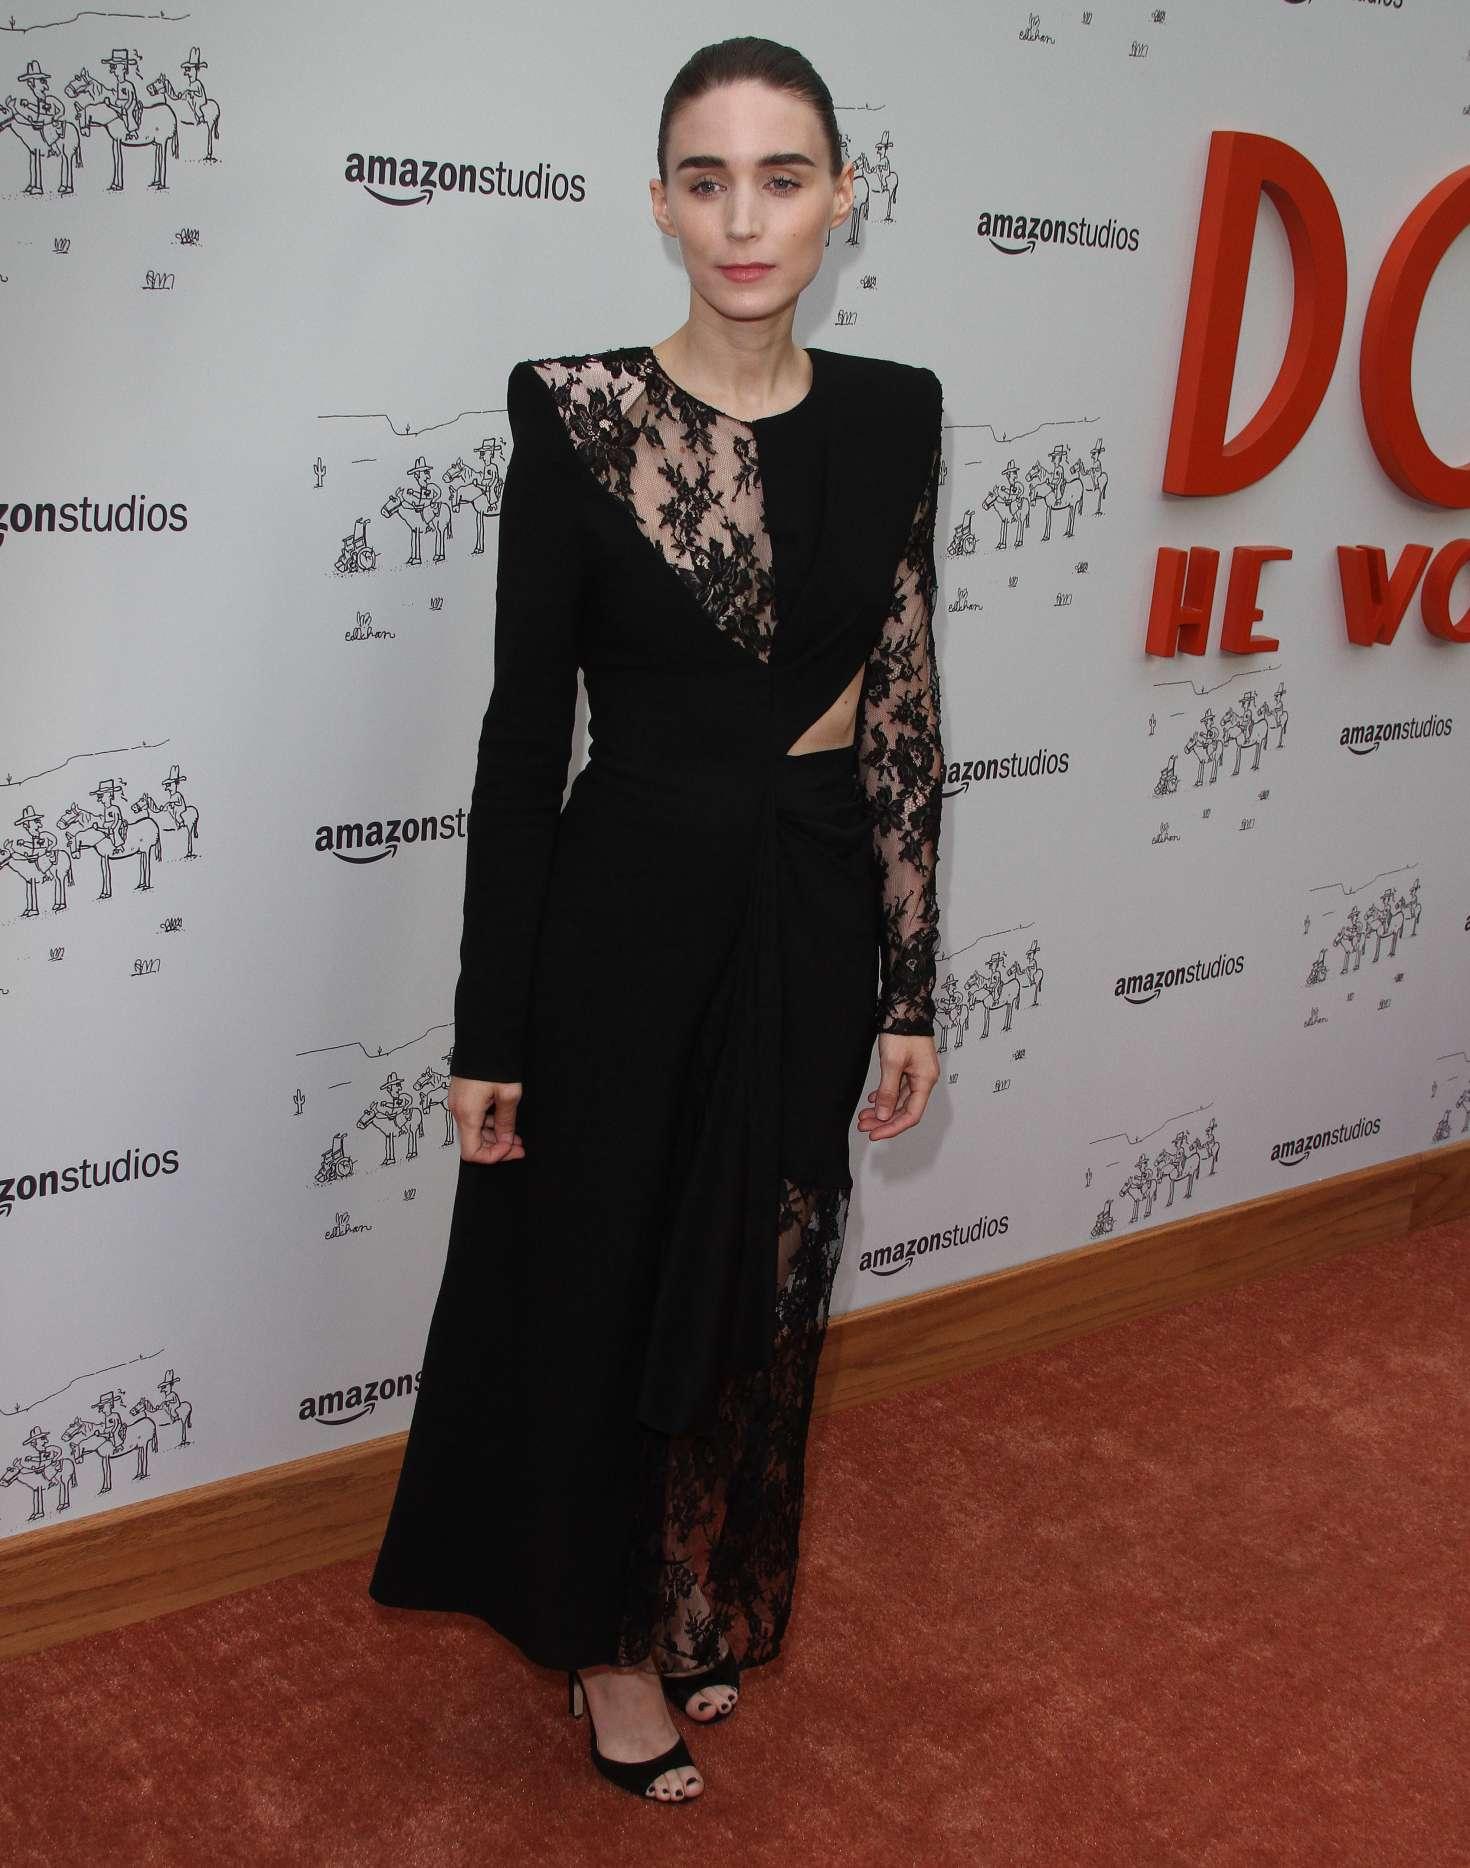 Rooney Mara 2018 : Rooney Mara: Dont Worry Premiere -04